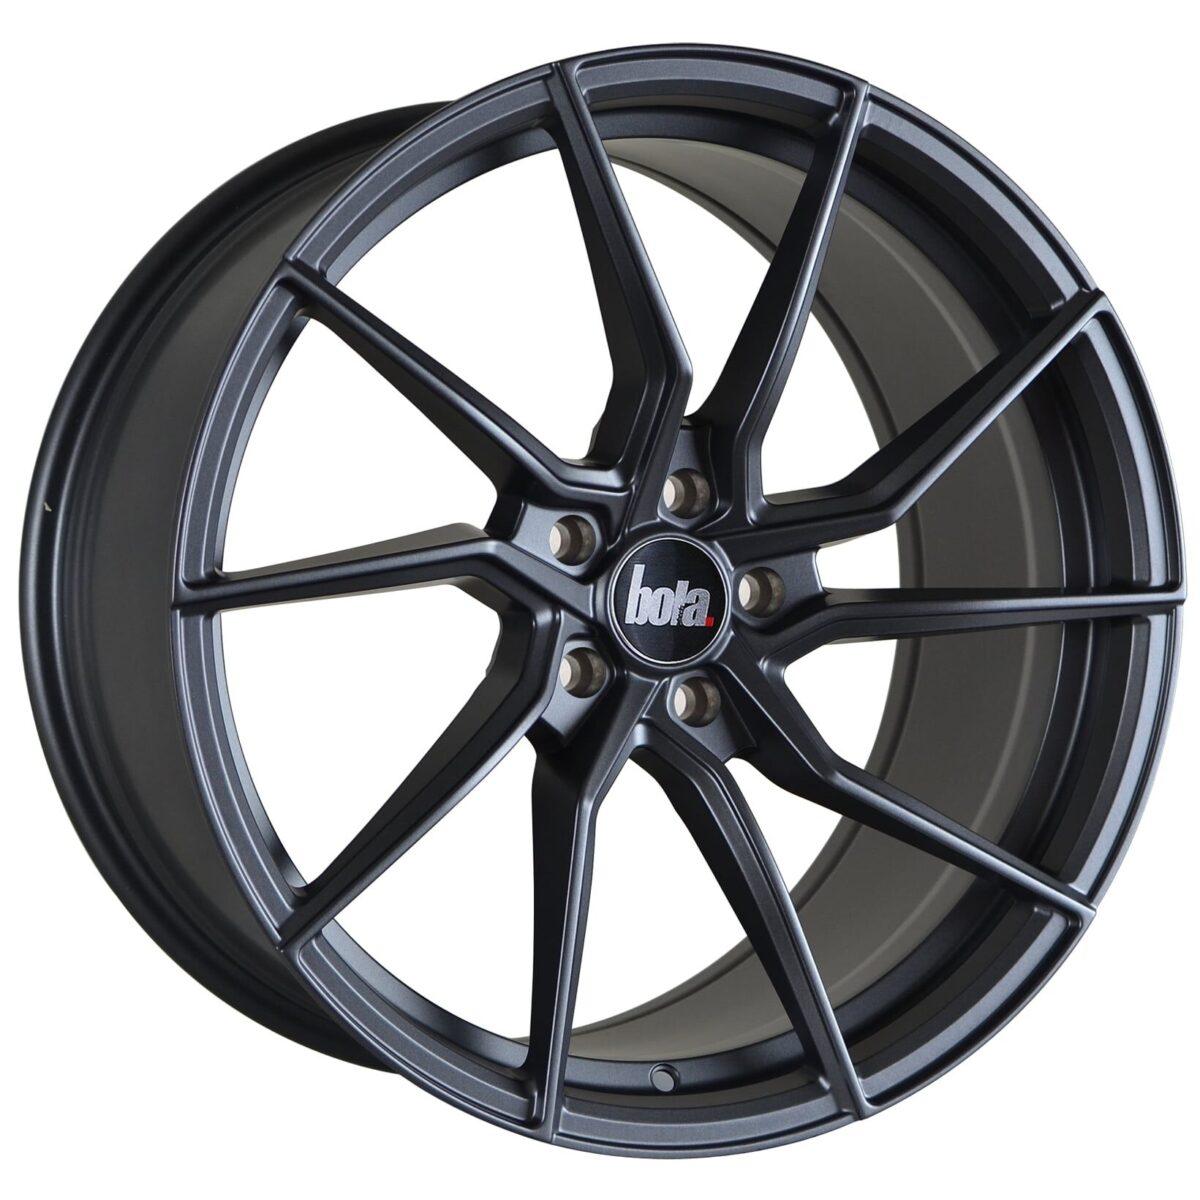 "18"" BOLA B25 Wheels - Matt Gunmetal - All BMW Models"